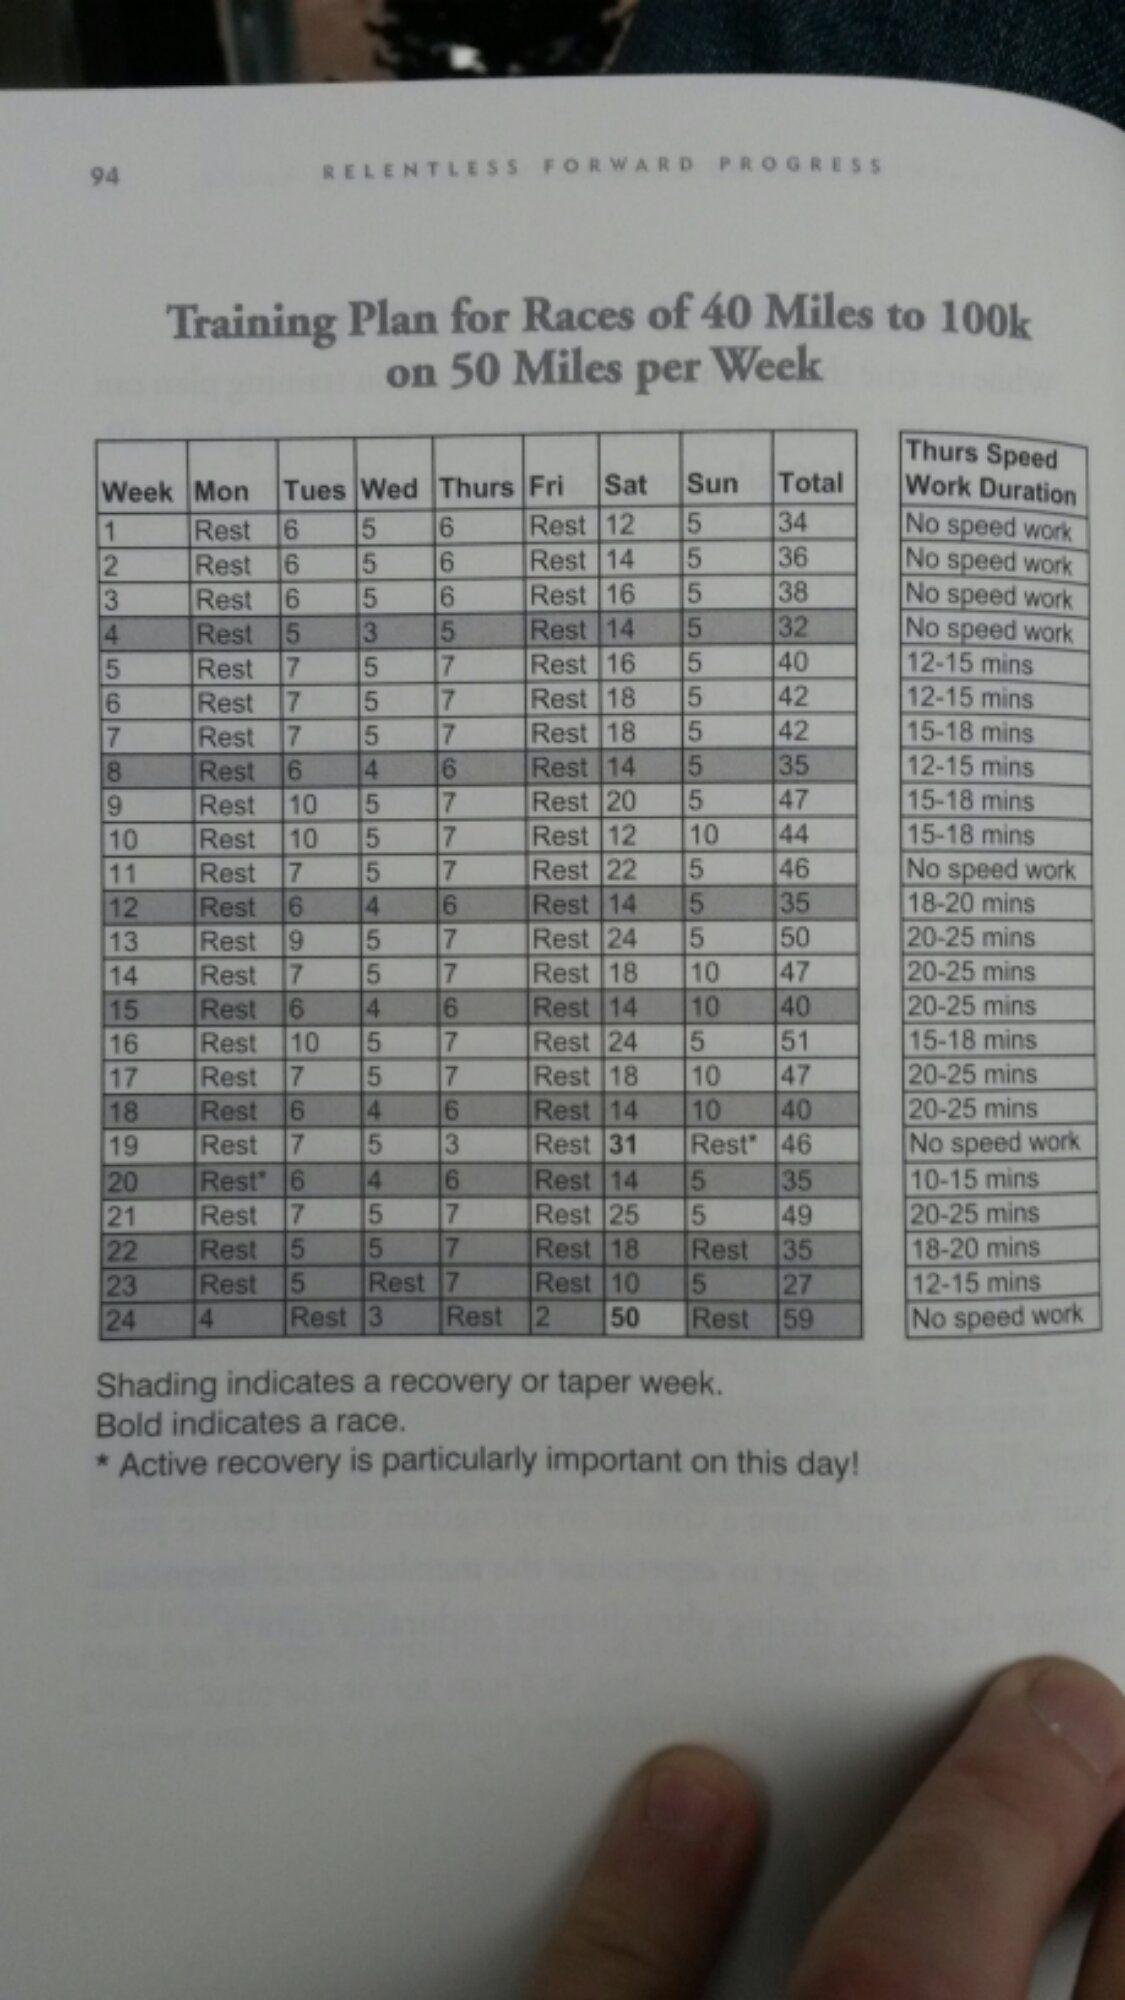 Relentless Forward Progress 40 mile race training plan